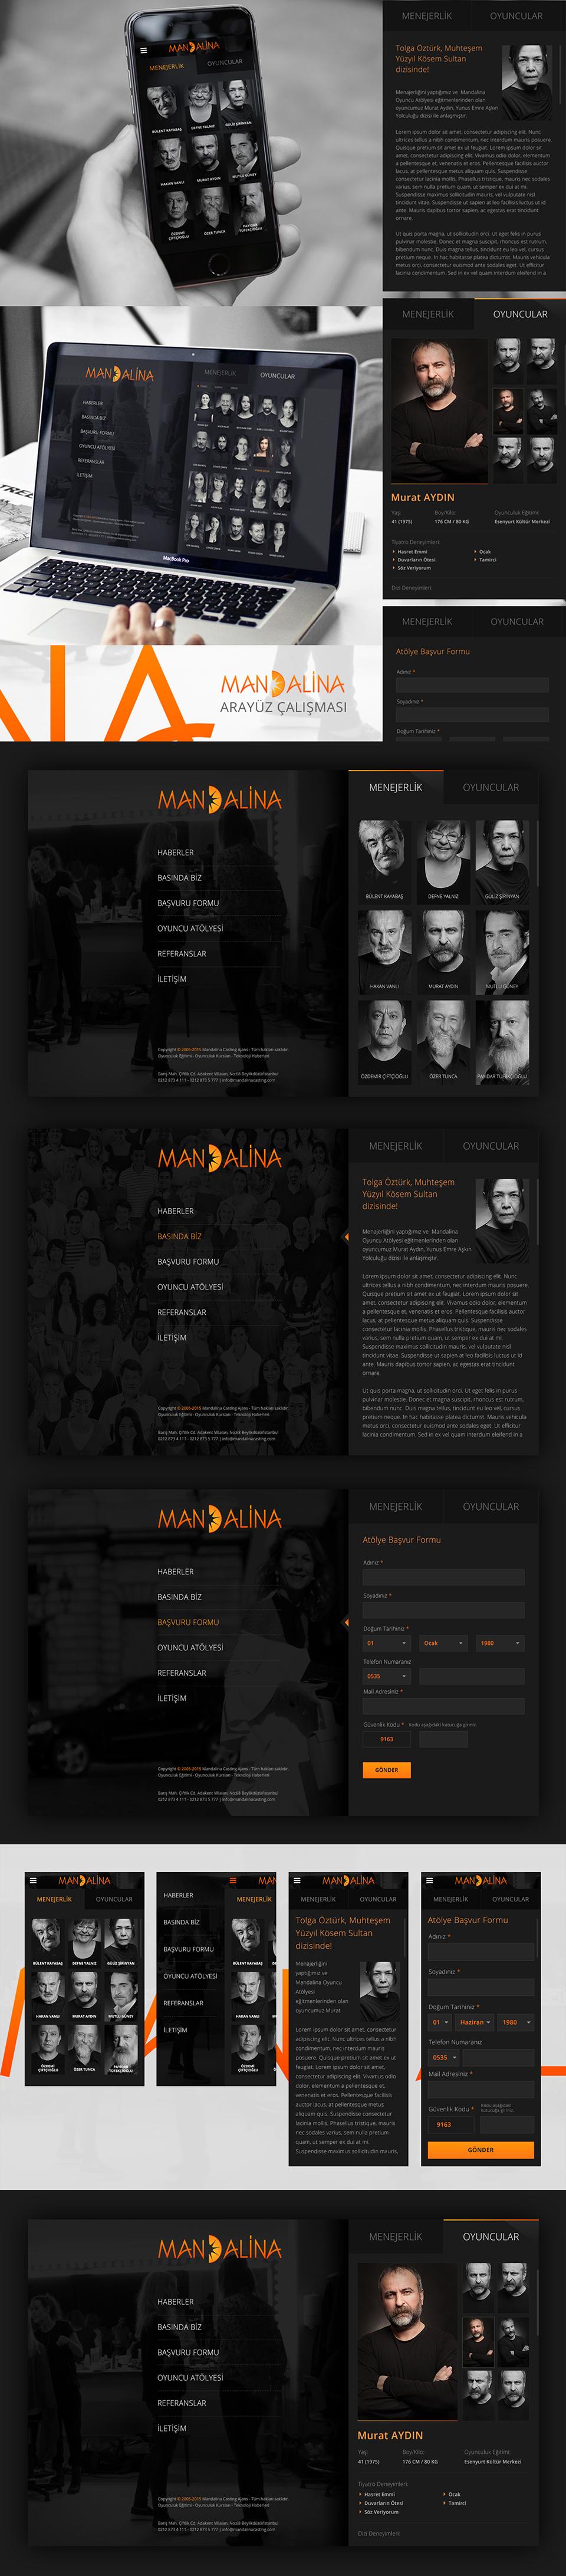 Mandalina Casting Ajans